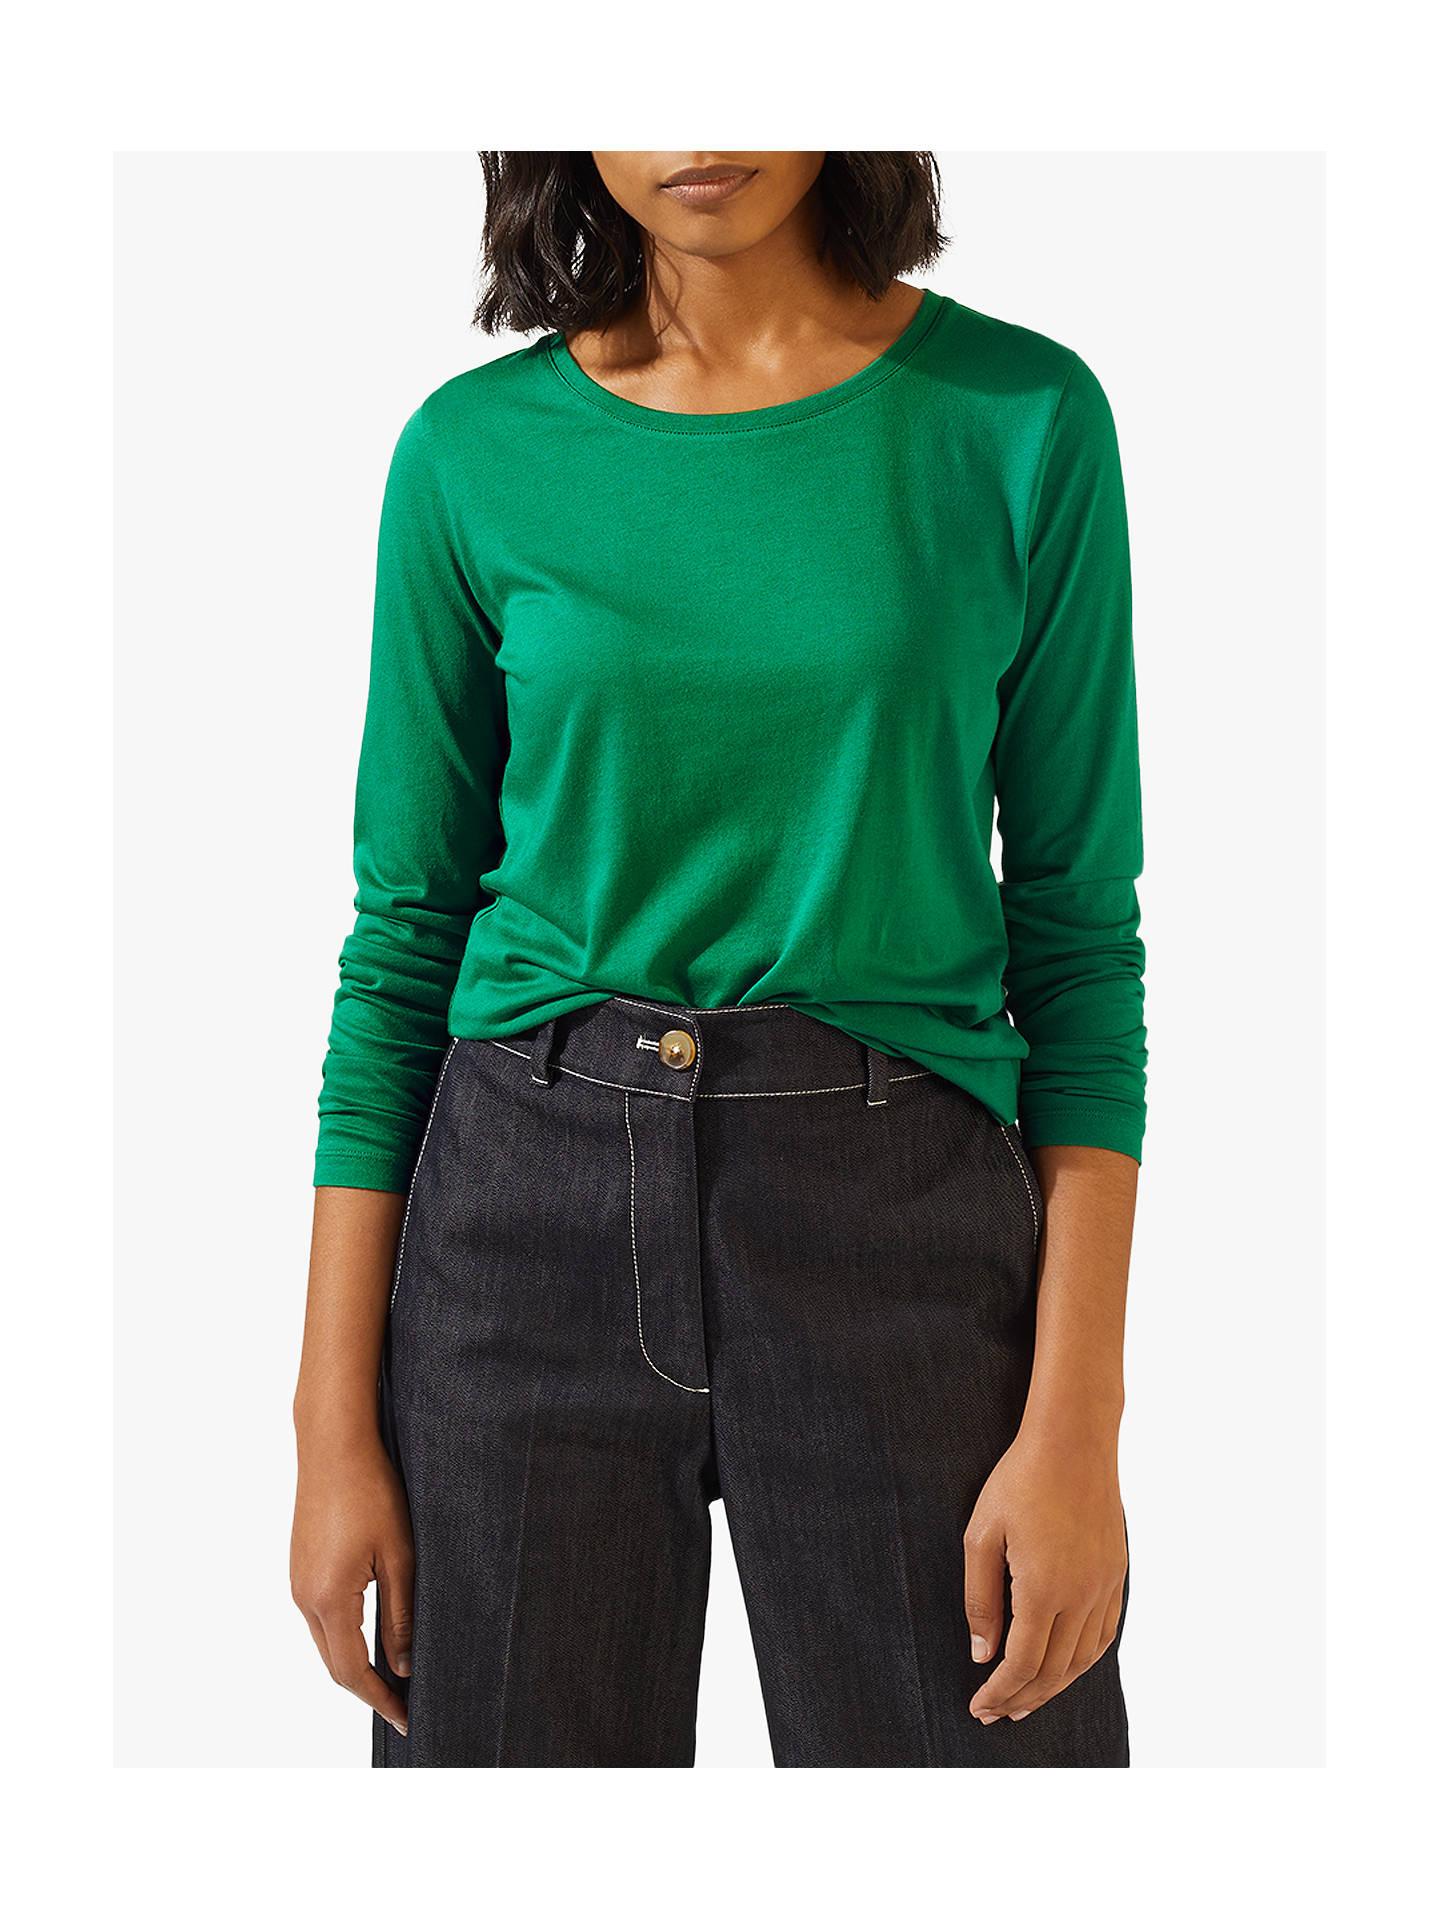 Jigsaw Pima Cotton Long Sleeve T Shirt, Emerald by Jigsaw